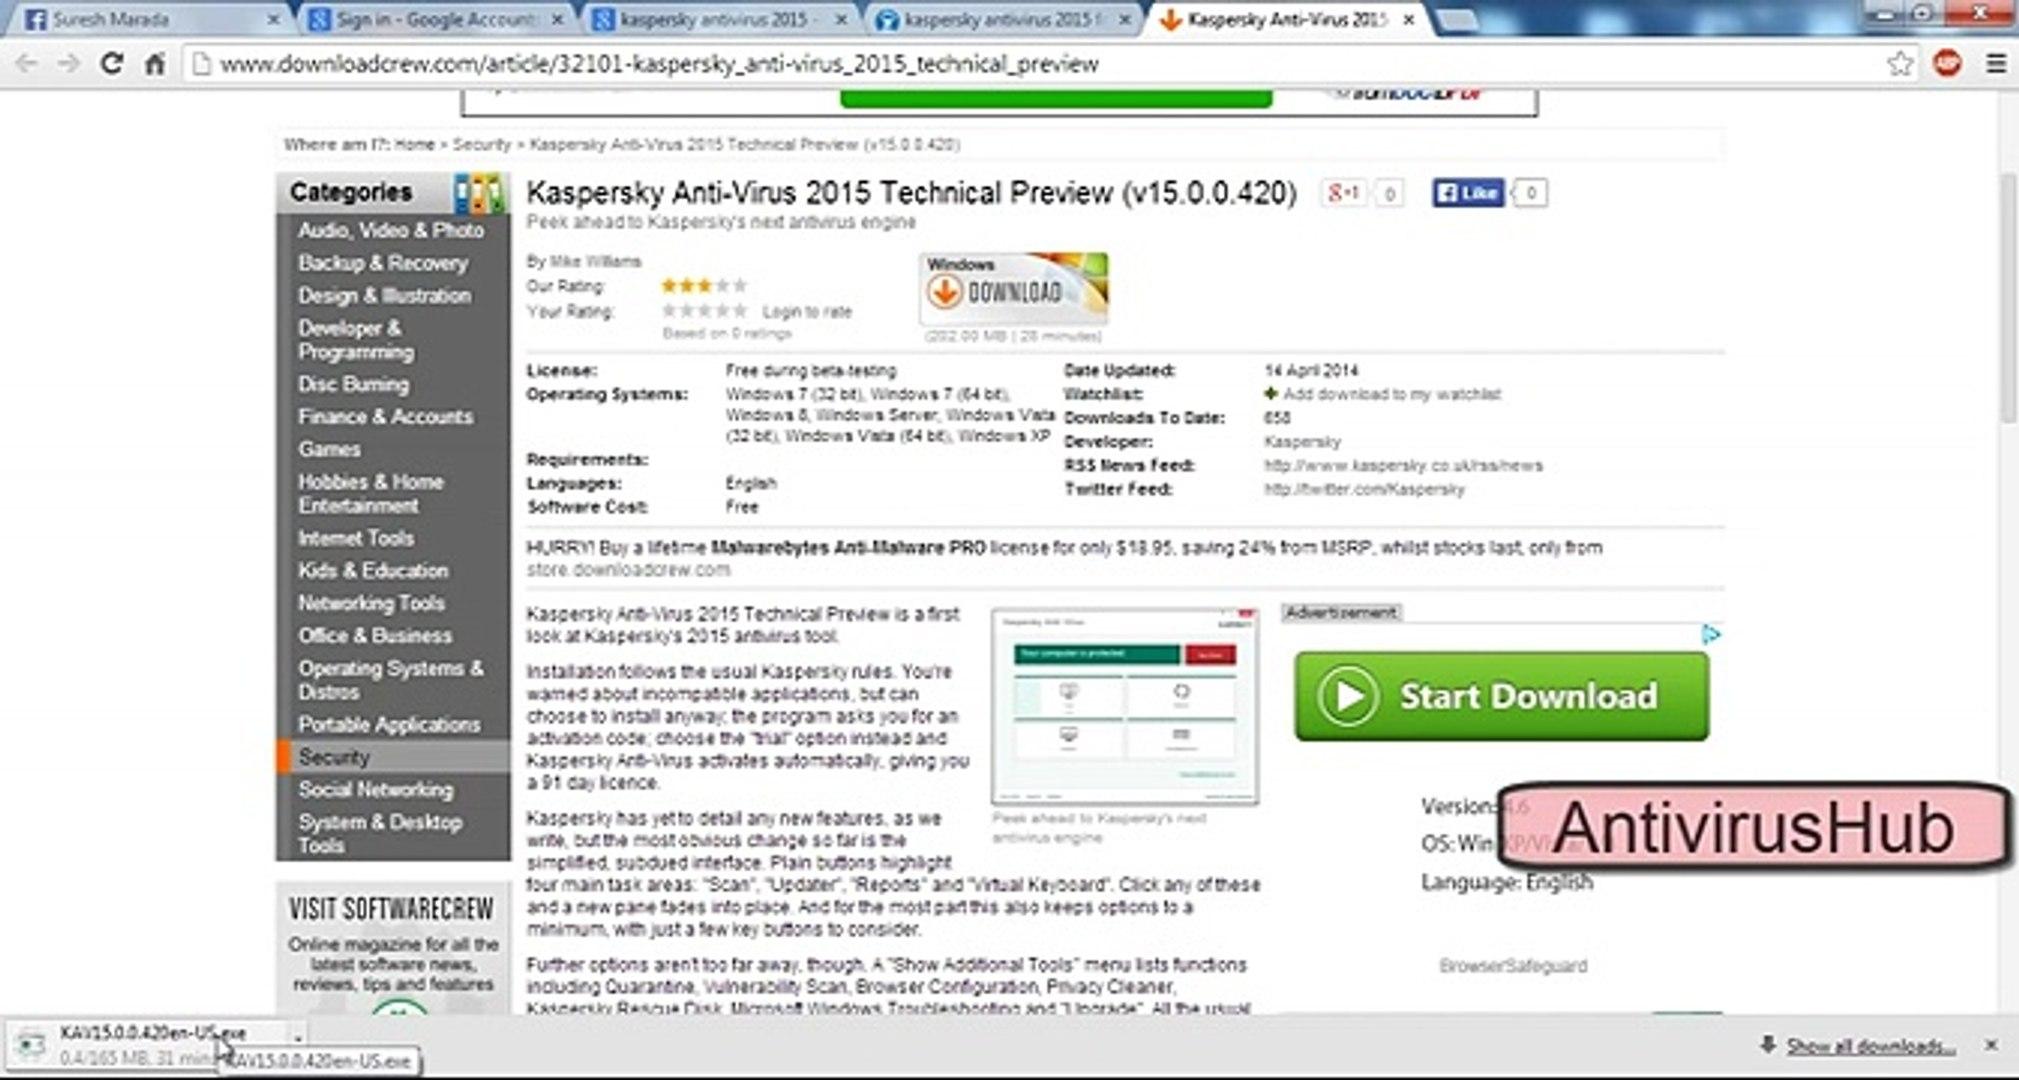 Adobe after effects cs6 serial key generator key